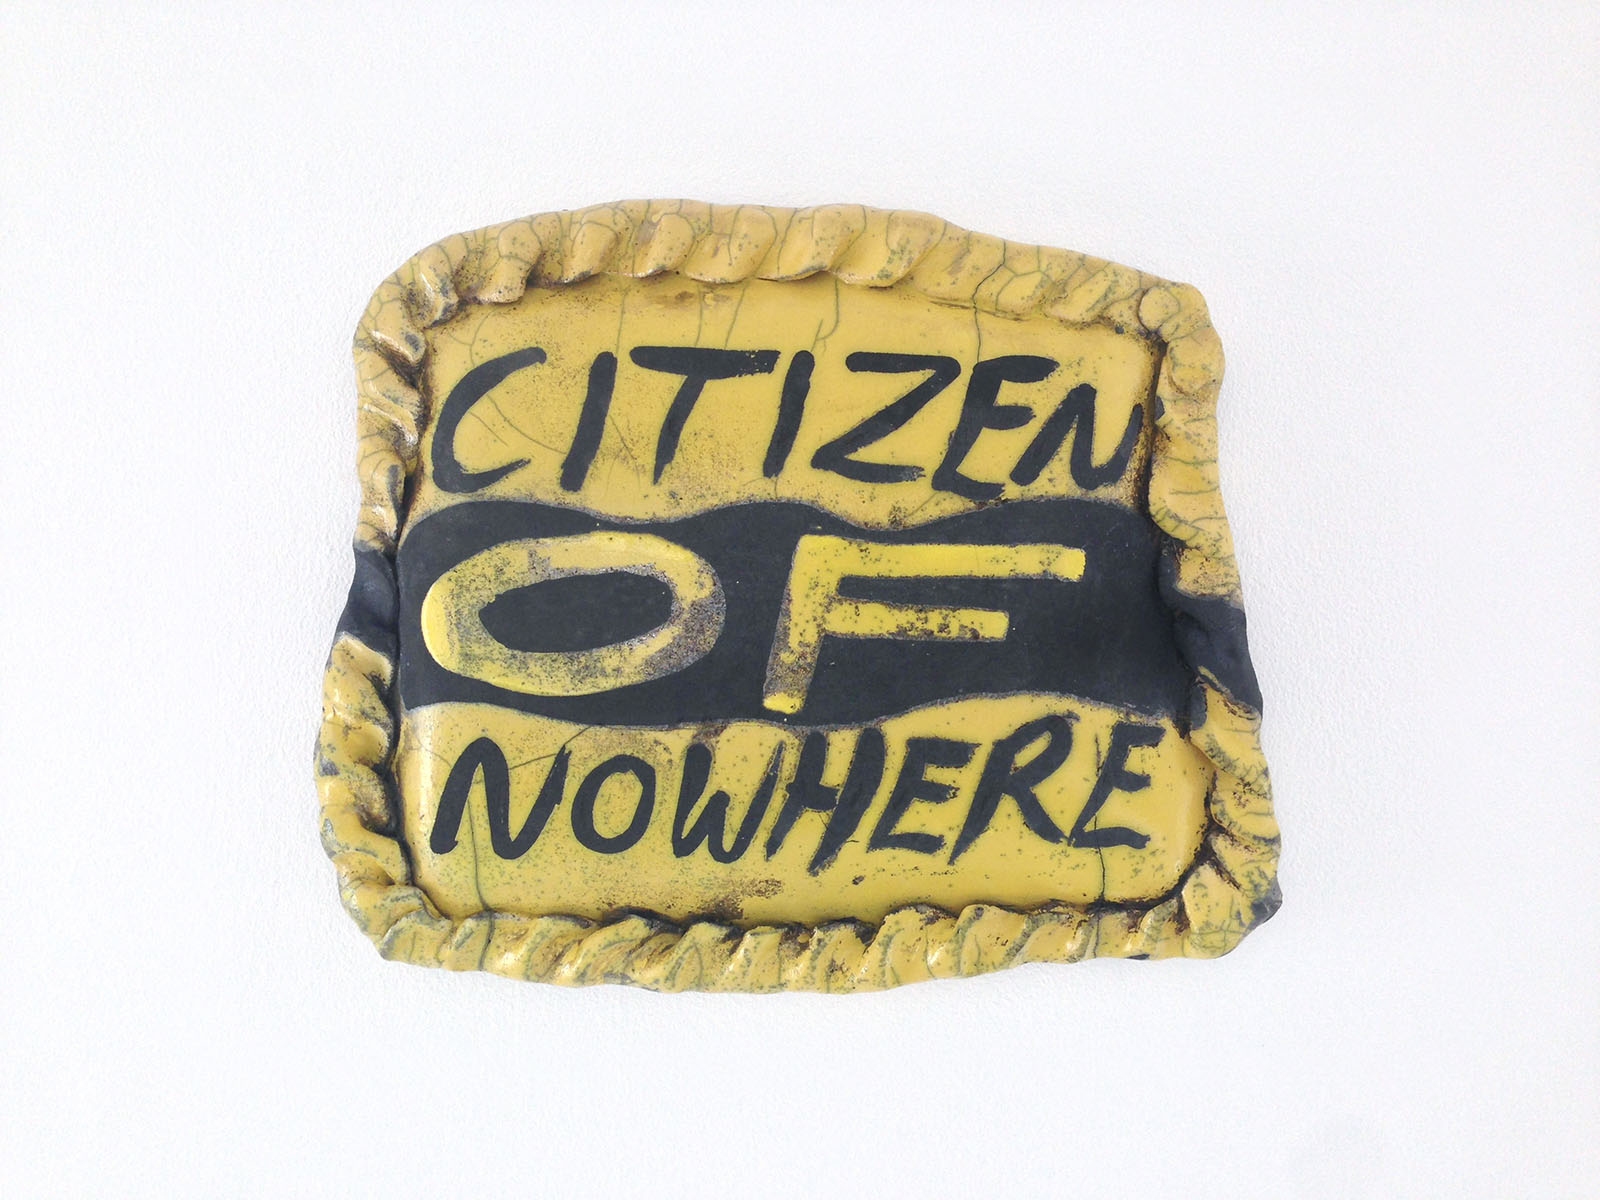 Untitled (citizen of nowhere pasty) , 2017, raku ware,26 x 31cm